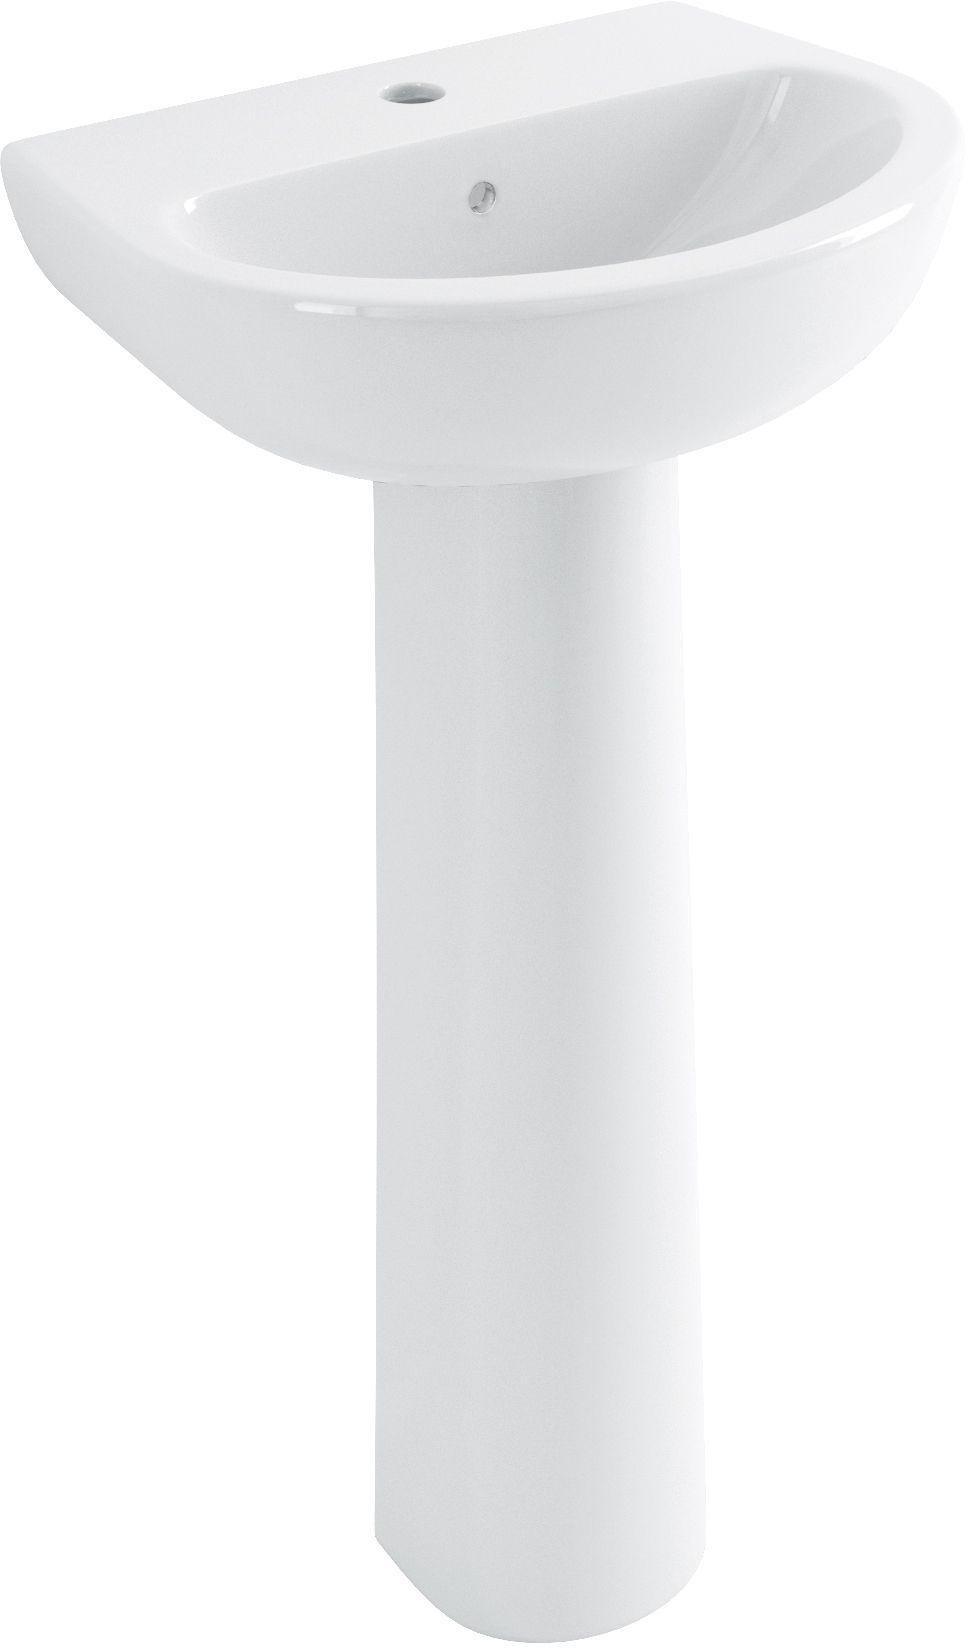 Eliana Maple 1 Tap Hole Cloakroom Basin with Full Pedestal.